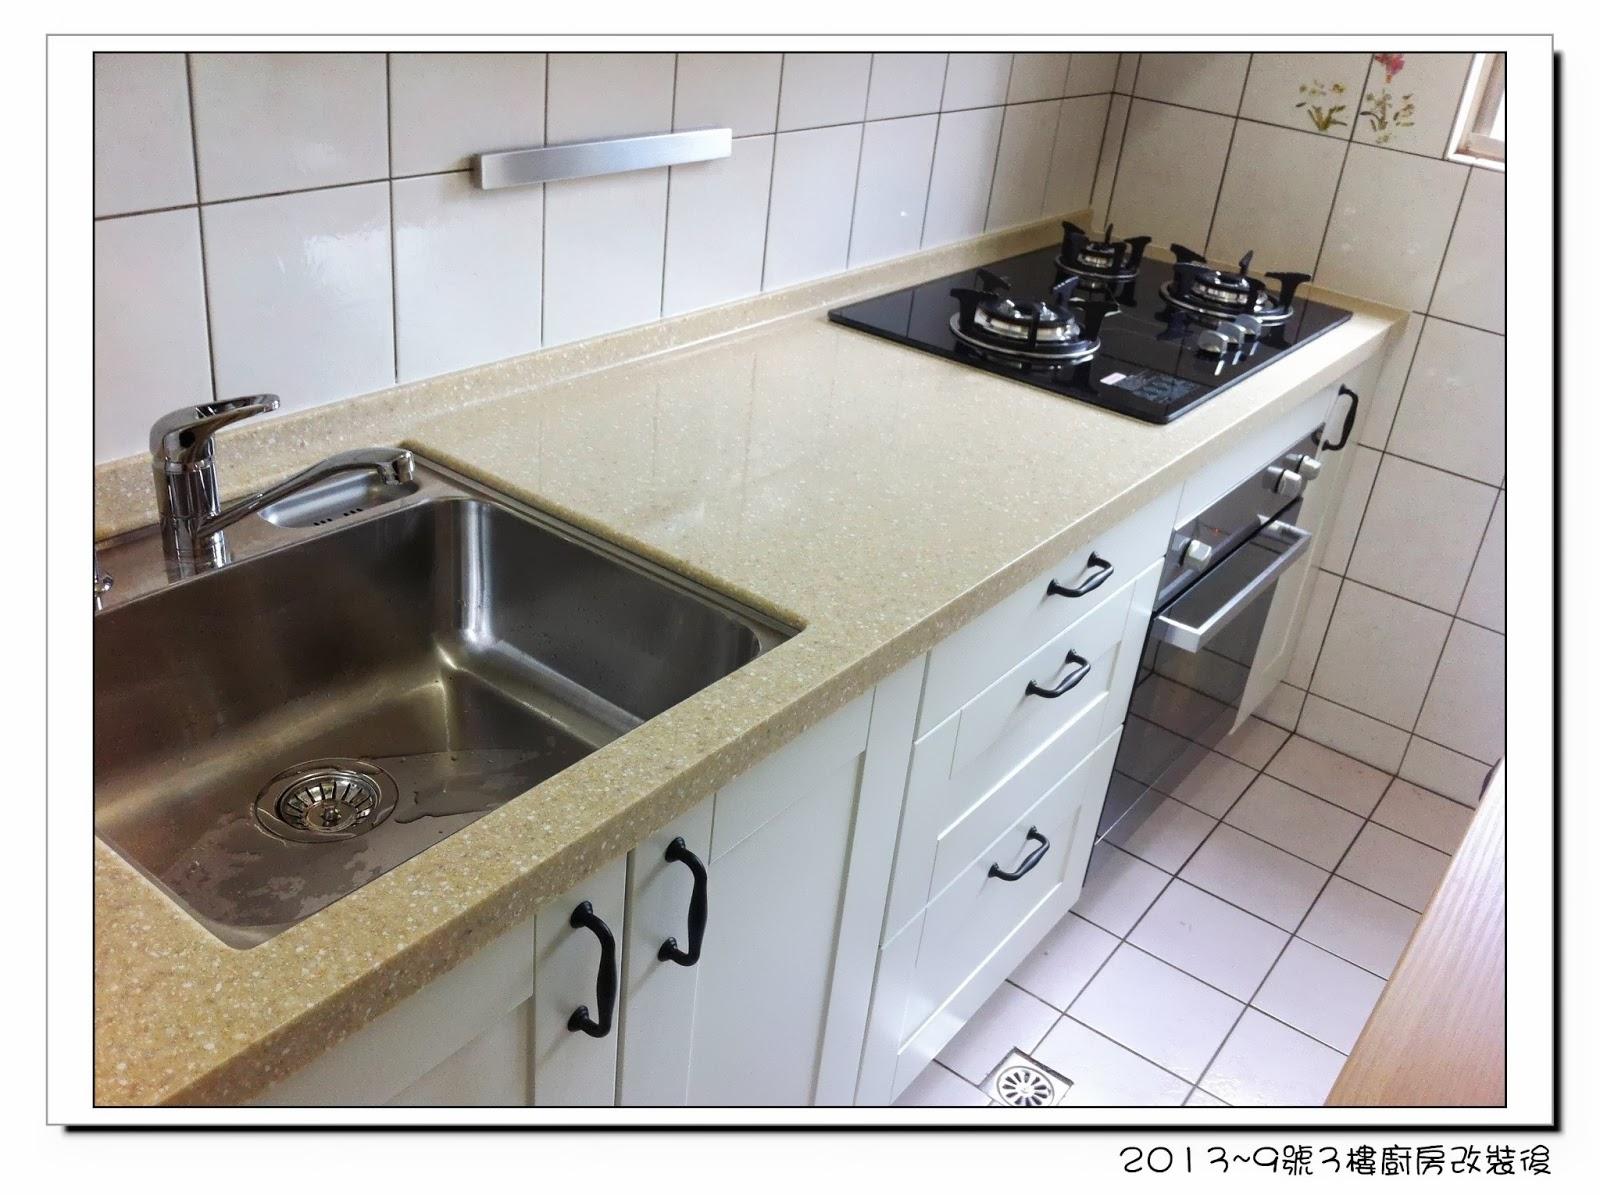 ikea kitchen countertops islands bar stools 9號3樓的廚房 改裝心得紀錄 le monde de catherine 工作檯面的空間 以及水槽旁的距離 都可以事先預訂